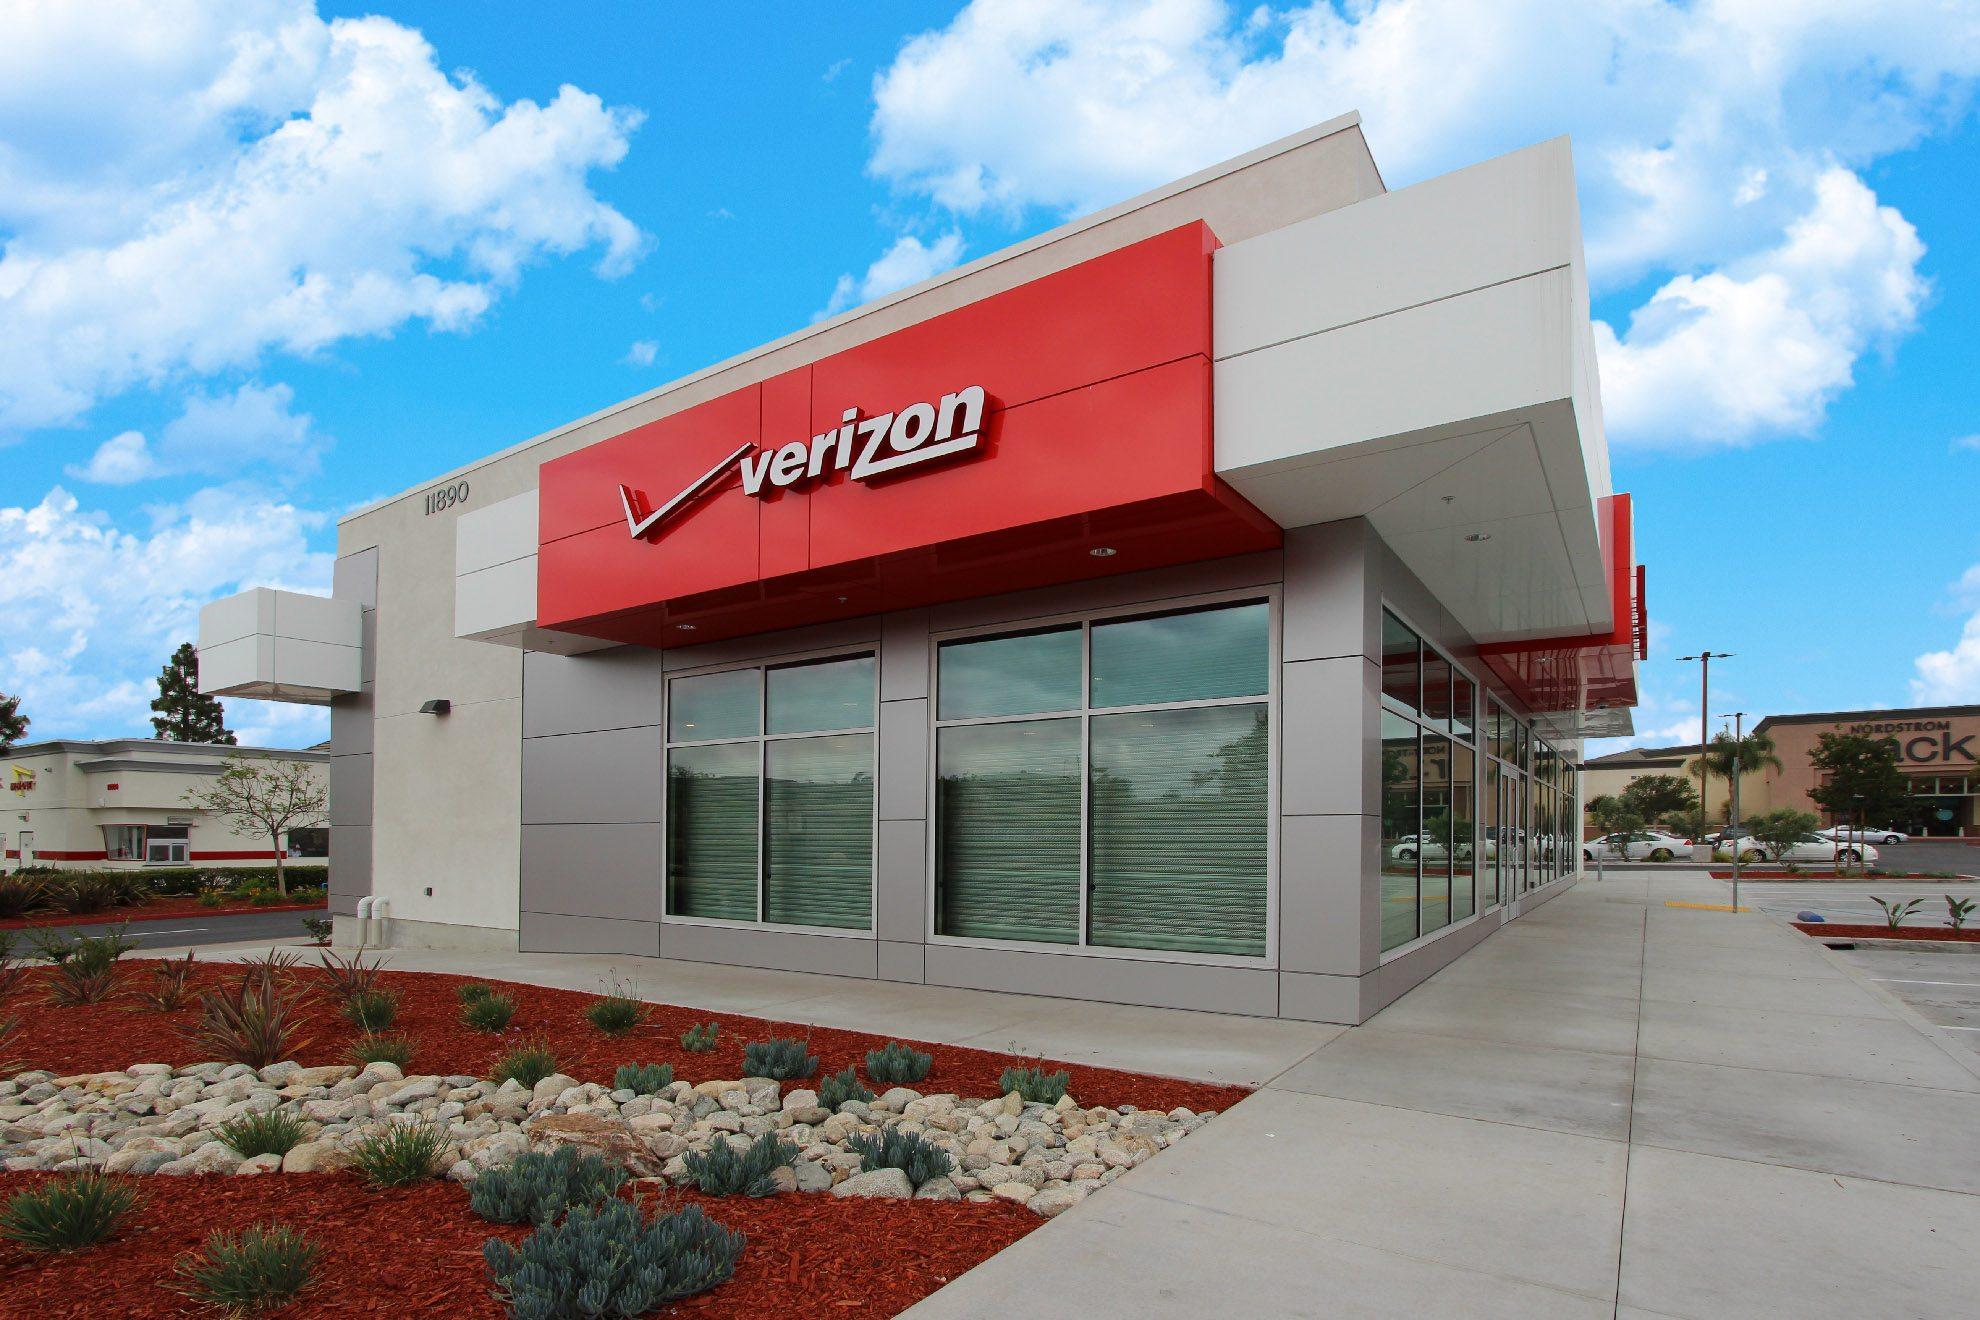 Verizon Building by Watkins Landmark Construction